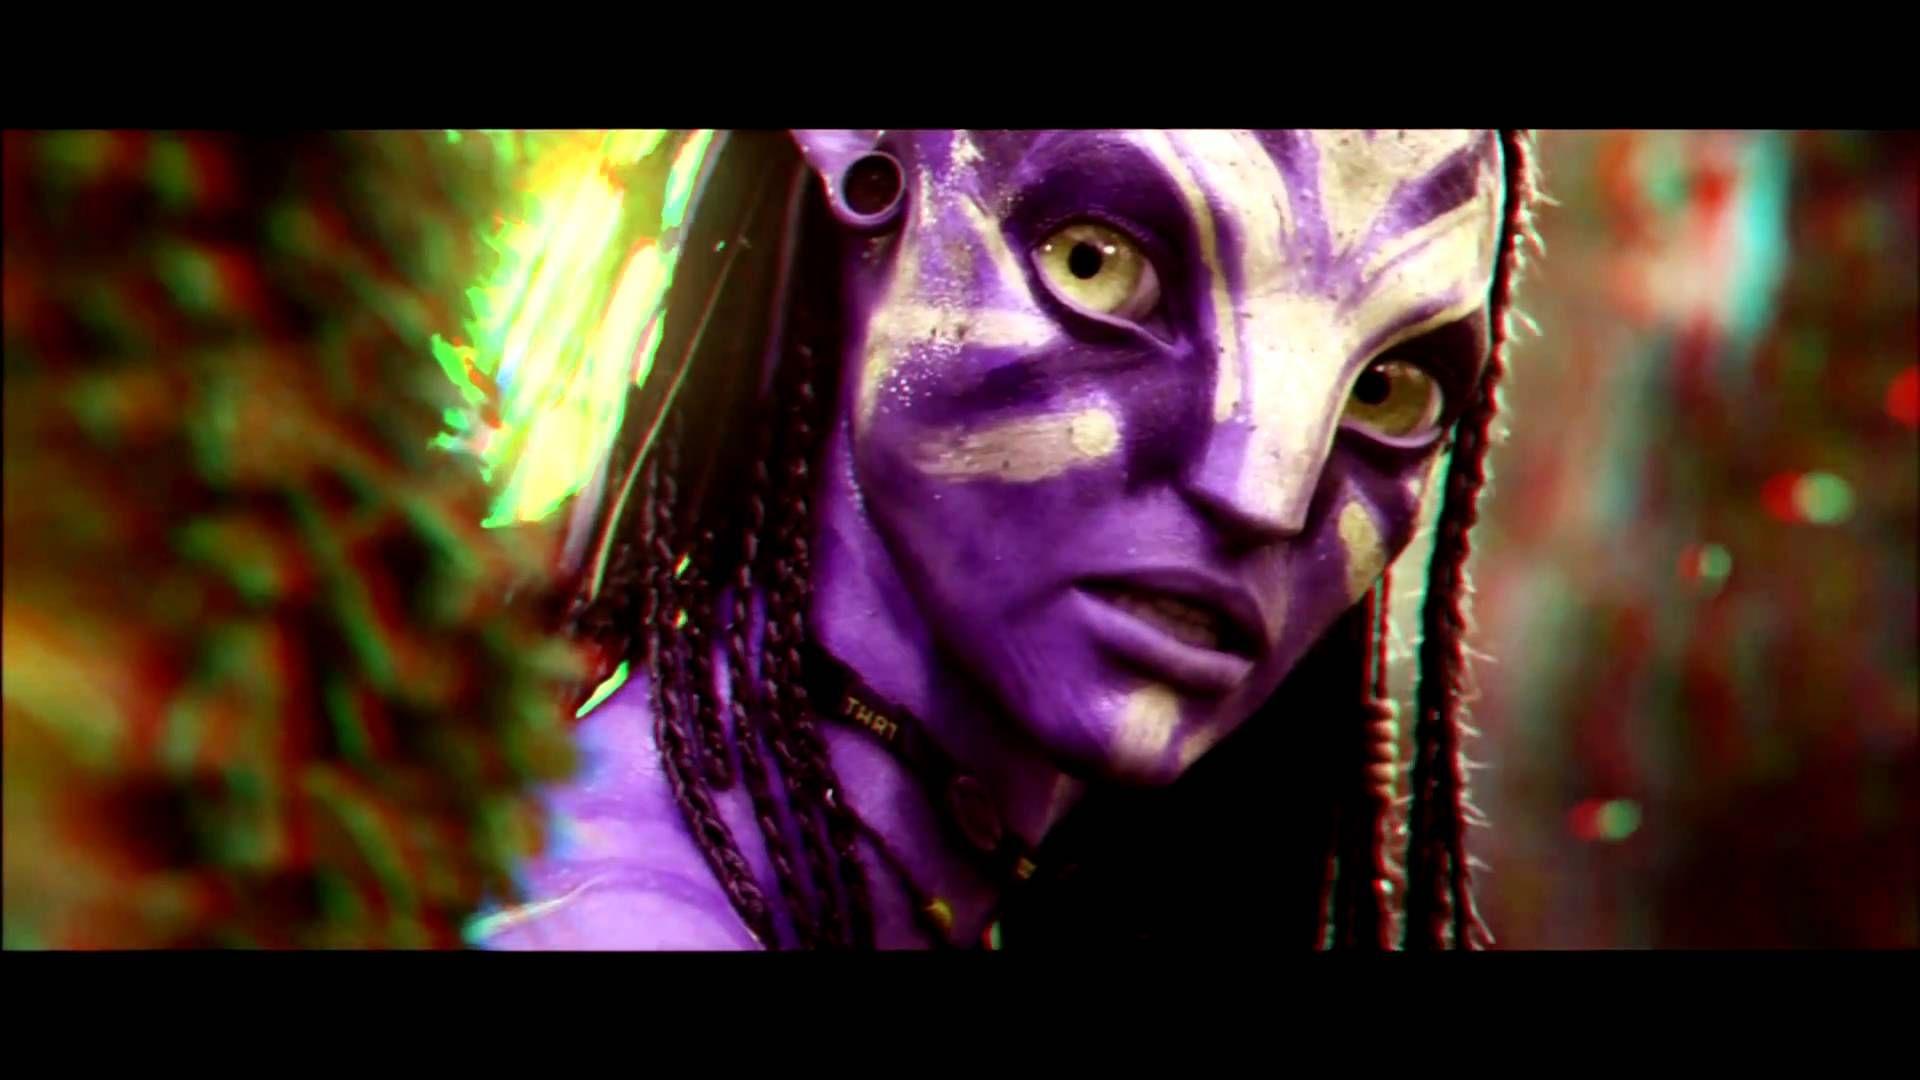 avatar 3d 1080p anaglyph trailer - youtube   3d photos   pinterest